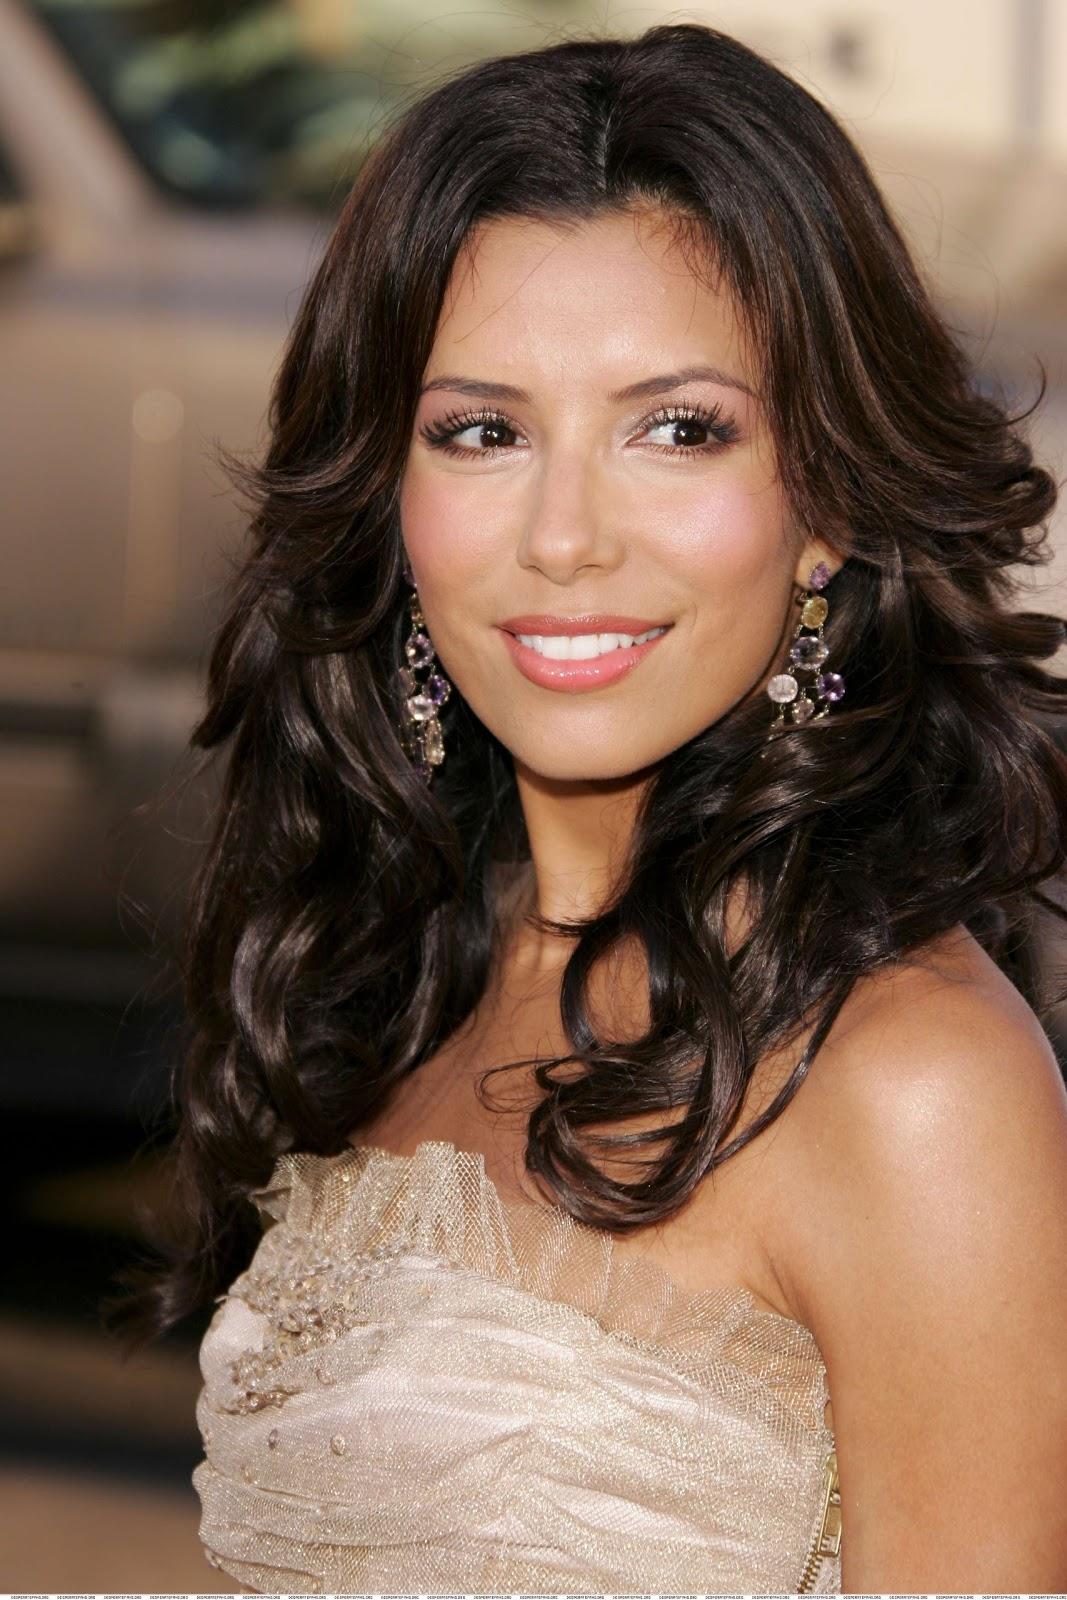 http://3.bp.blogspot.com/-eh00Jvra_B4/T0OB4uGKw5I/AAAAAAAACXc/FGGcIpA5txA/s1600/Eva-Longoria-Parker-eva-longoria-movie-film-actress-model-pictures-hollywood%2B%25252821%252529.jpg